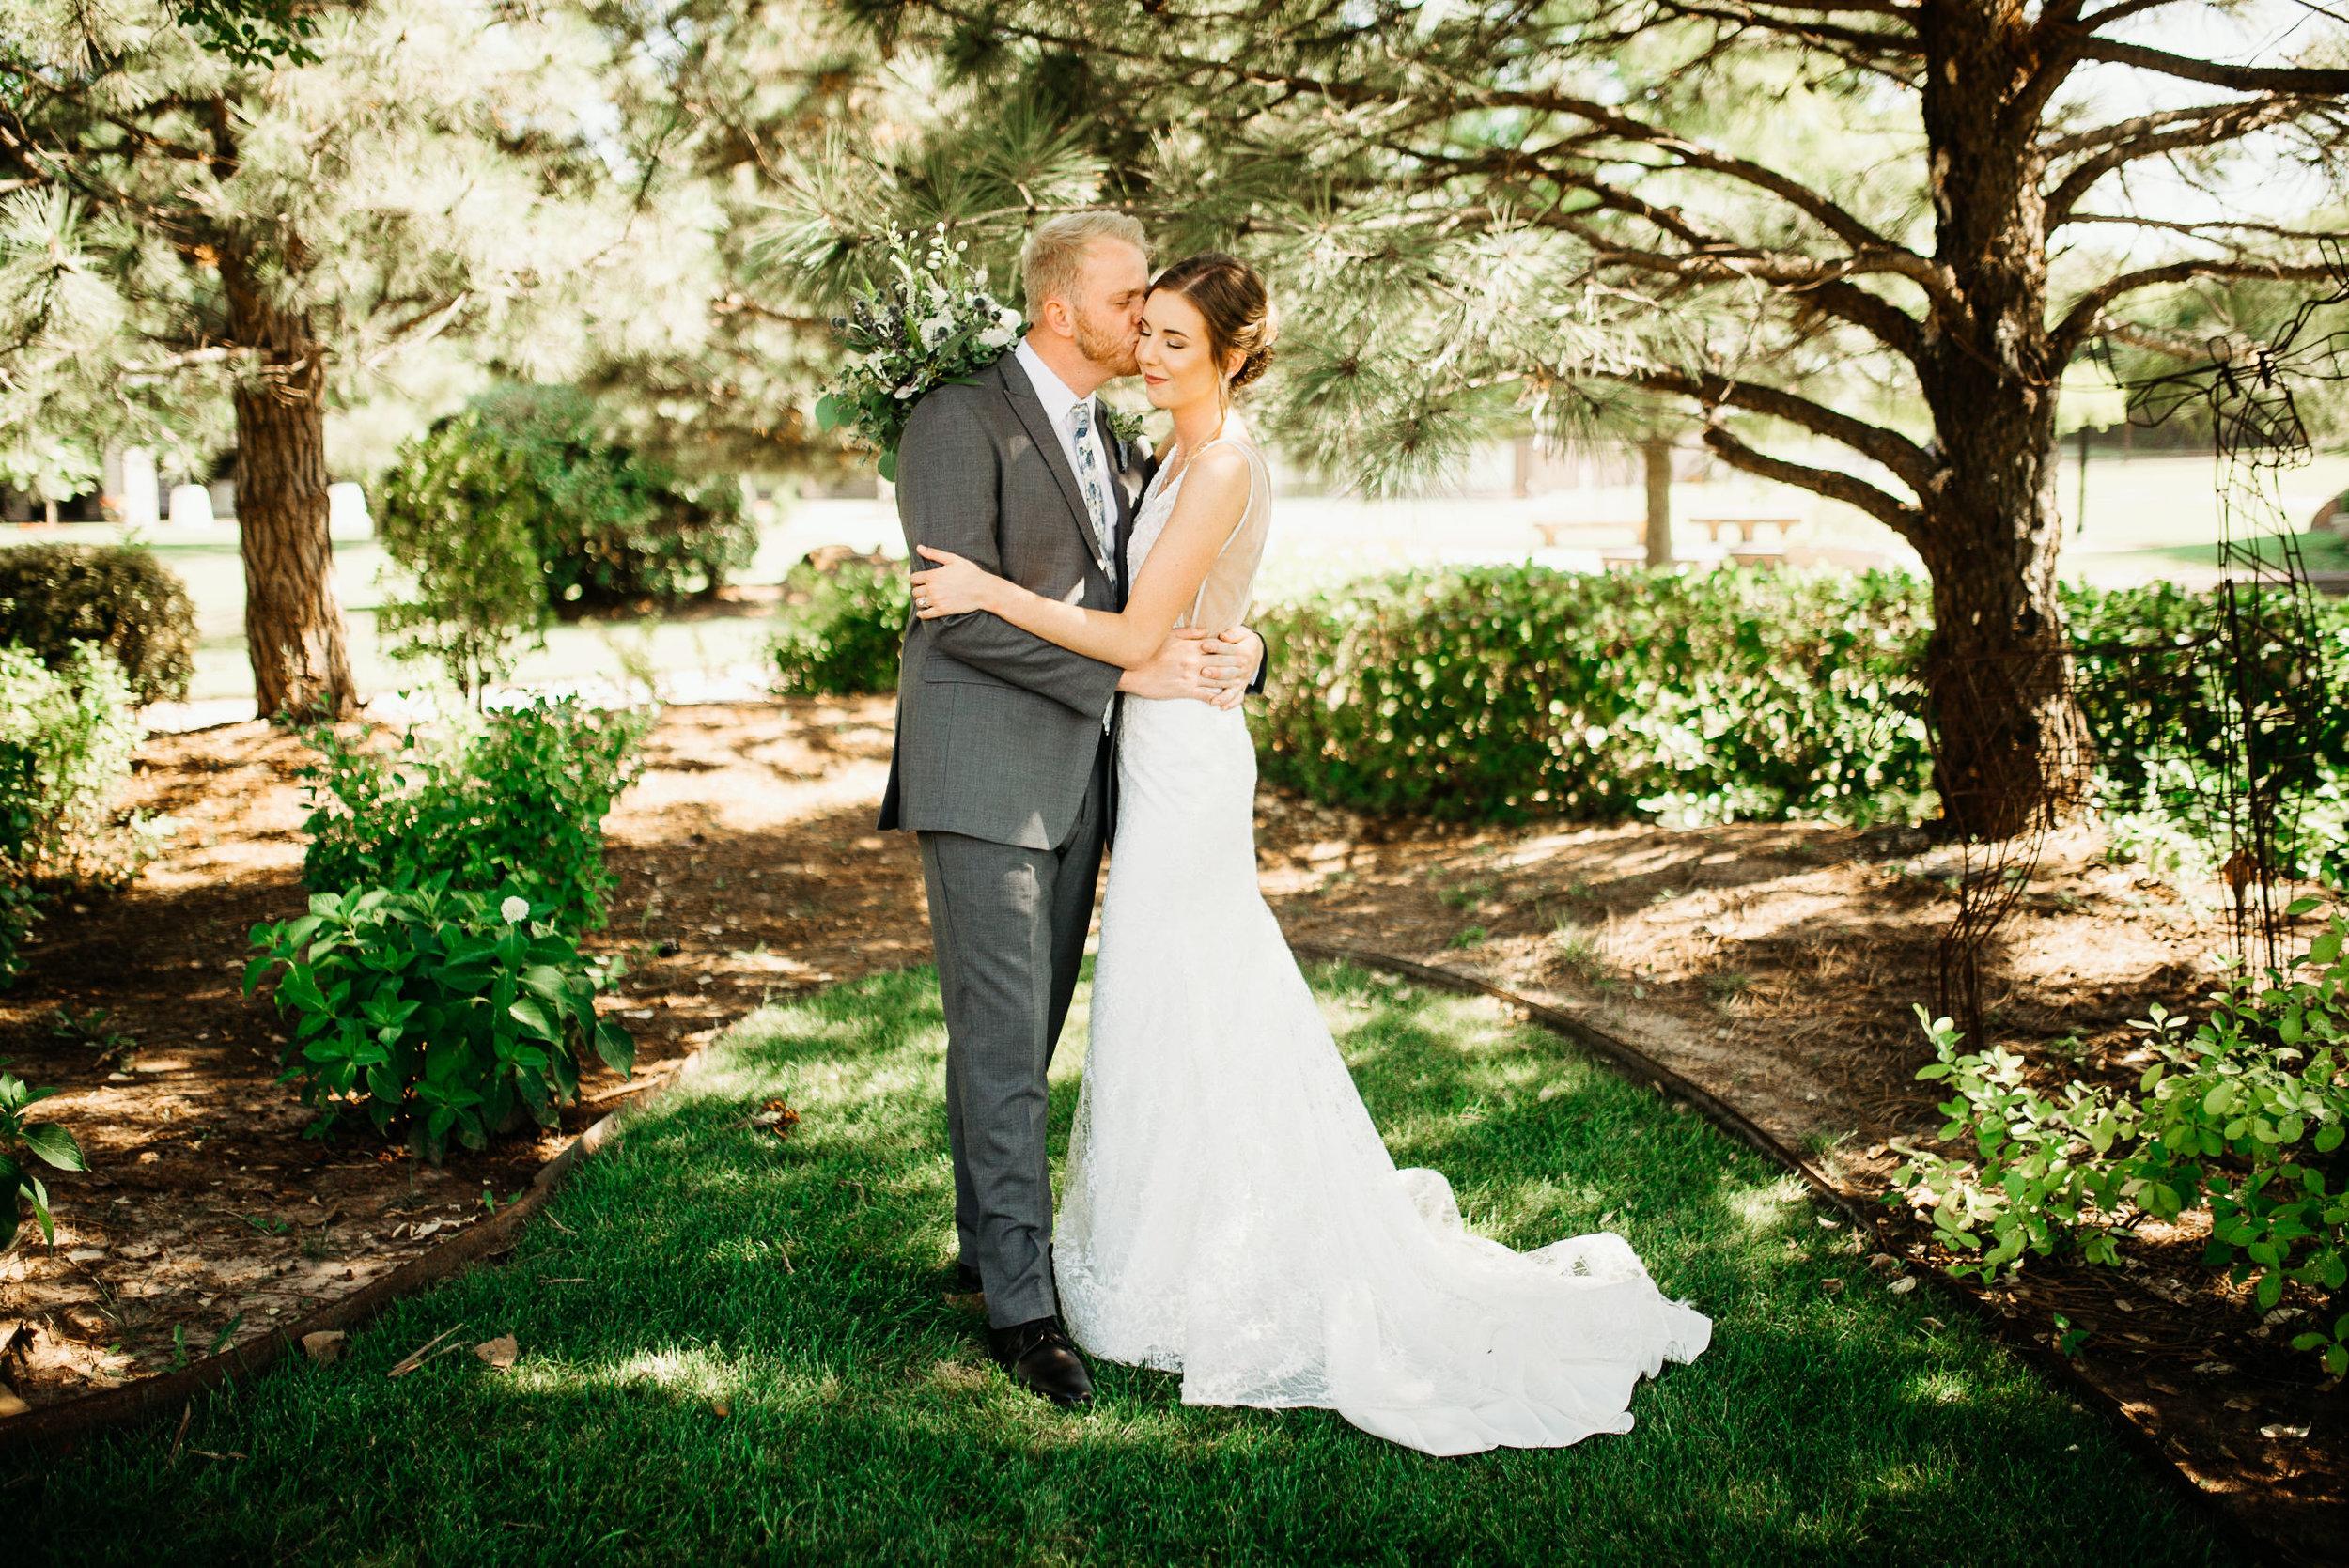 okc-wedding-photographer-coles-garden-wedding-okc-best-wedding-photographers-48.jpg